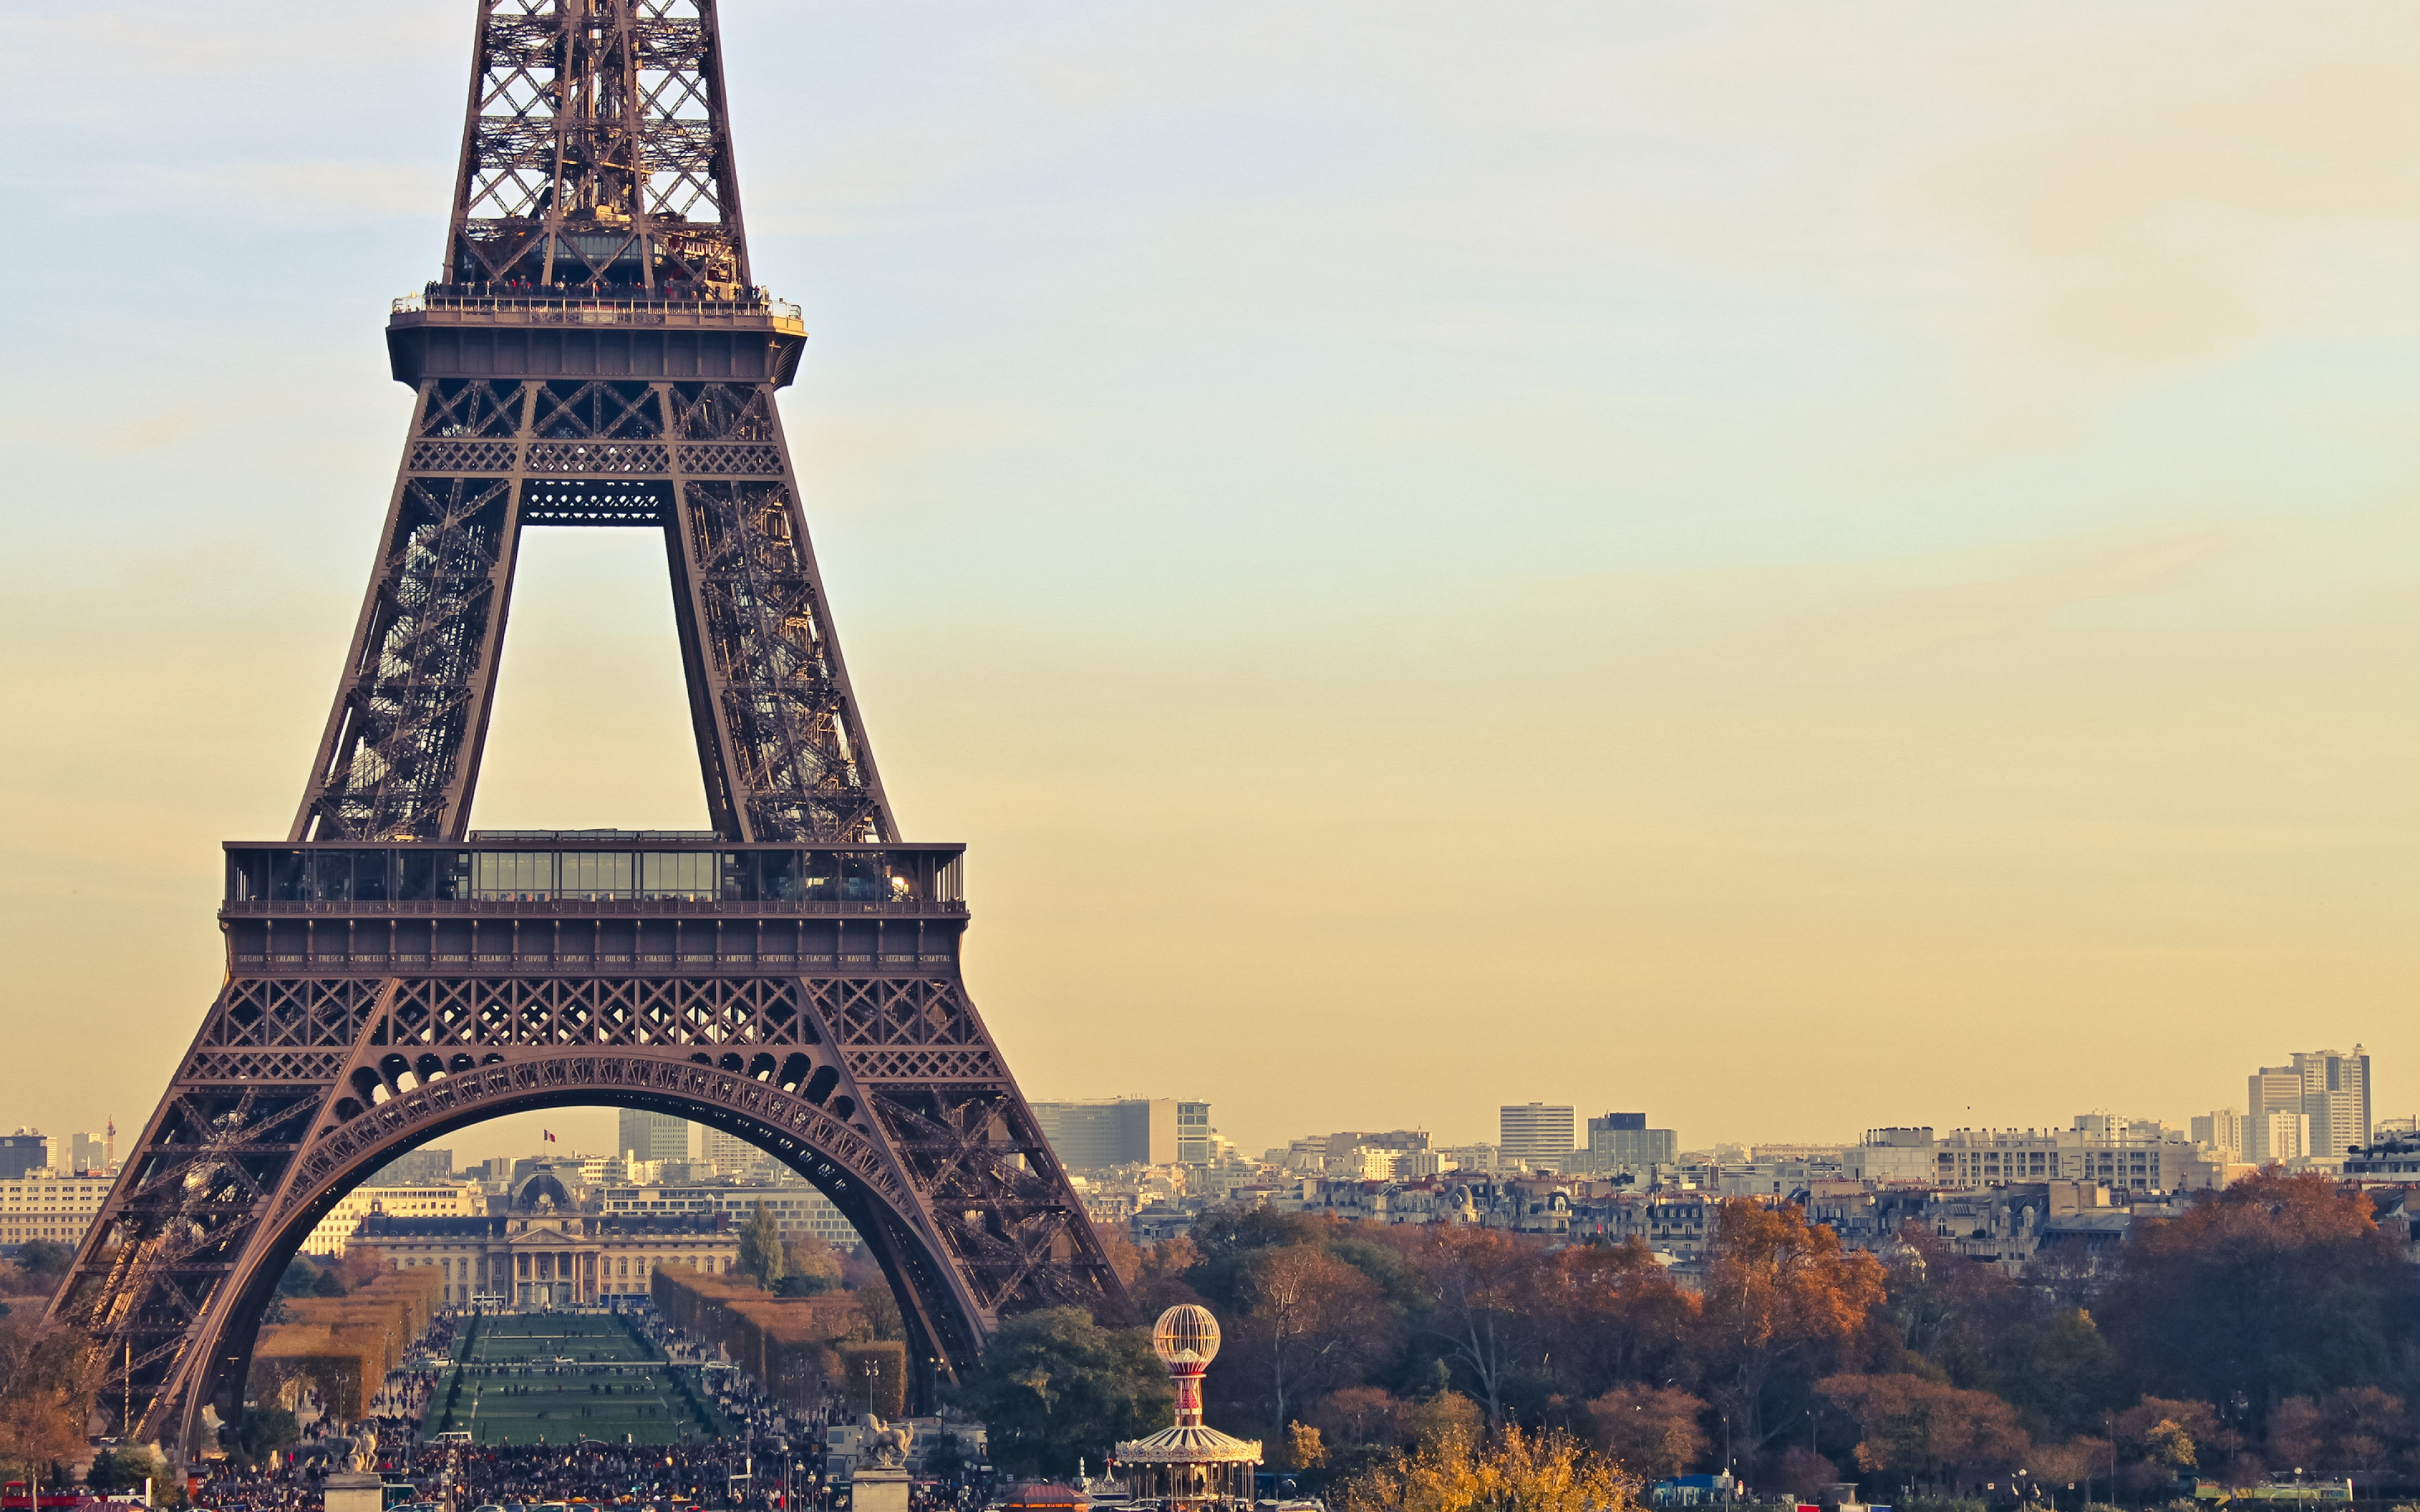 Free Download Download Wallpaper 3840x2400 Paris France Eiffel Tower Ultra Hd 4k 3840x2400 For Your Desktop Mobile Tablet Explore 50 4k Nature Wallpaper Winter France 4k Hd Wallpaper Best